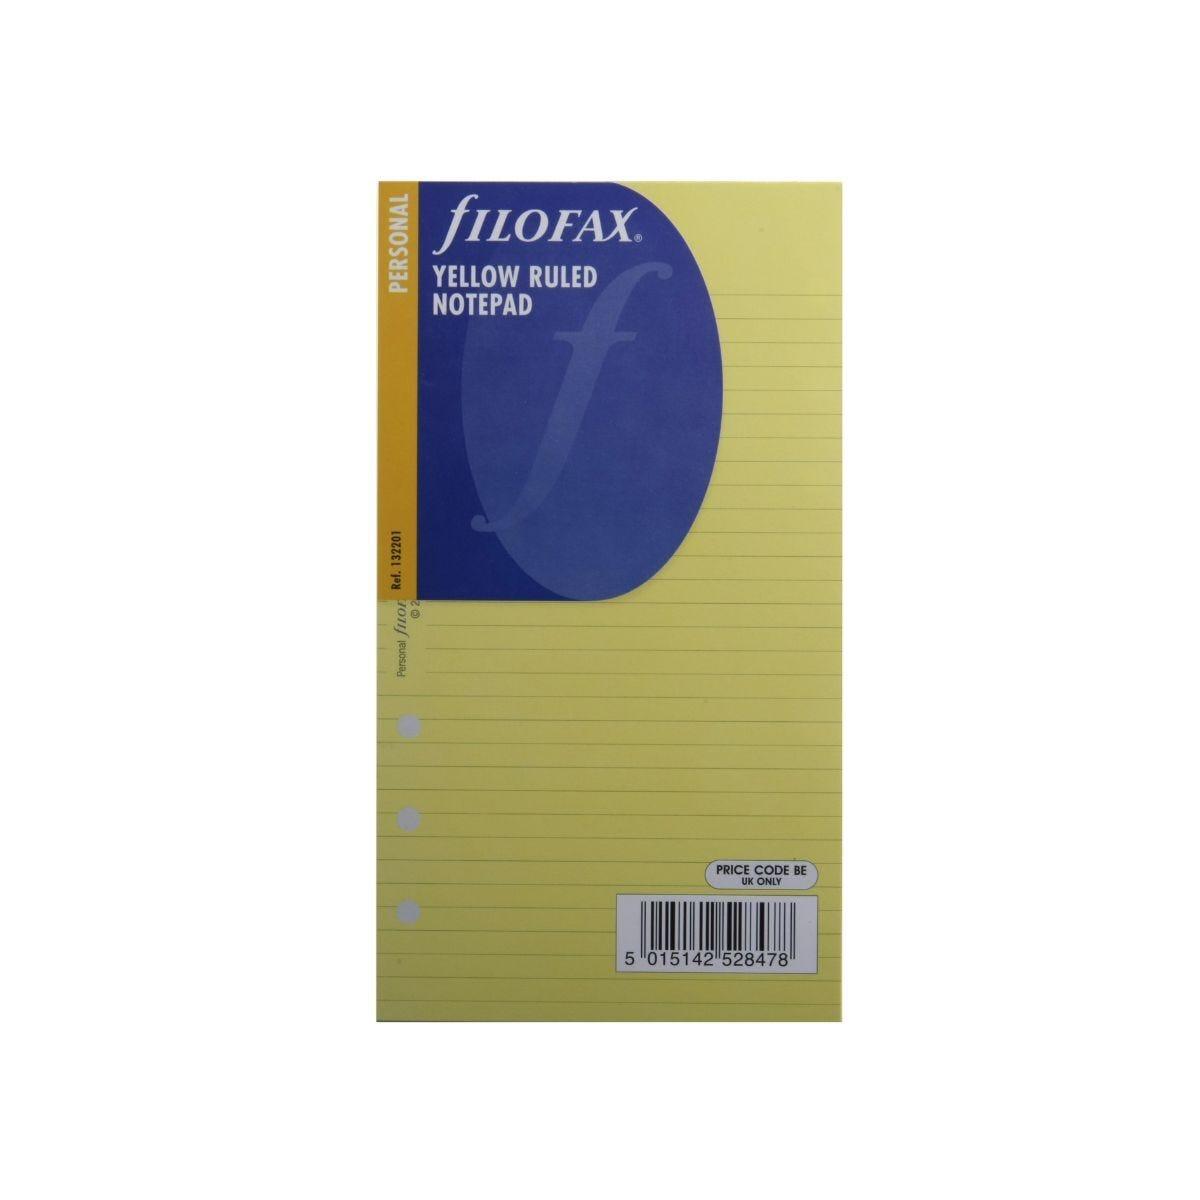 Filofax Refill Personal 100 Sheets Notepad Ruled